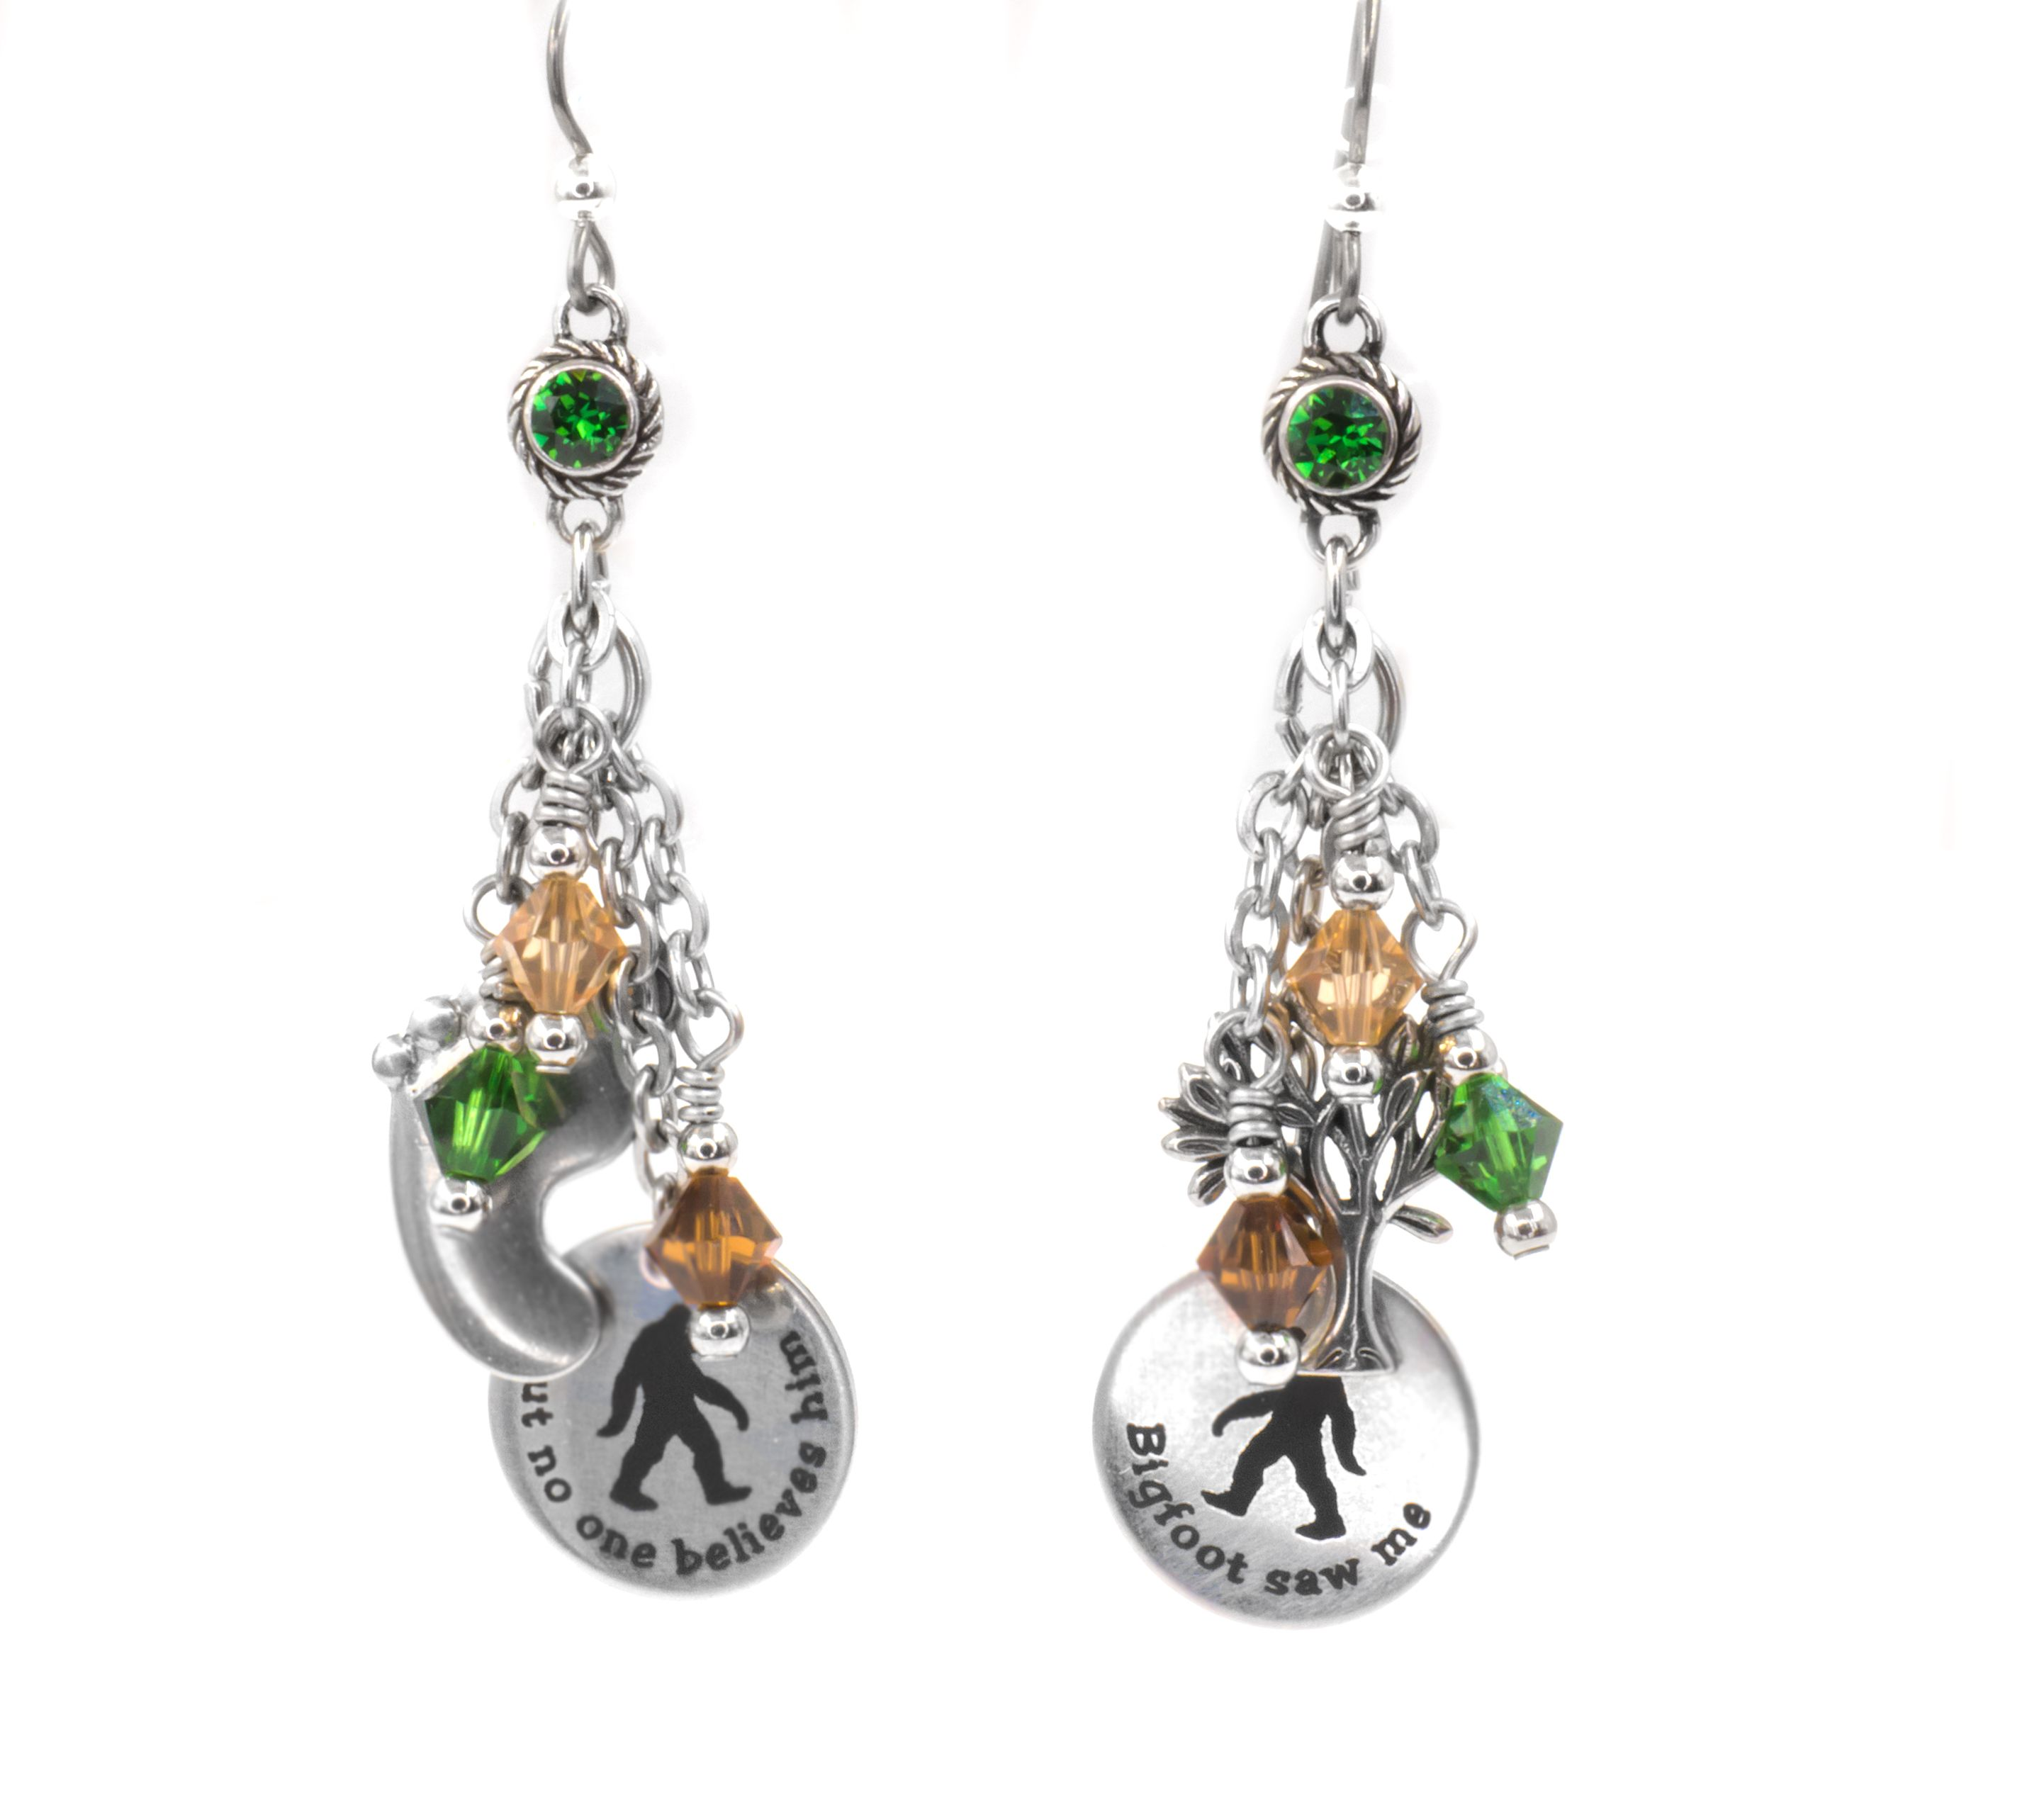 Surgical Steel Wires Celtic Emerald teardrop crystals on Chandelier Earrings